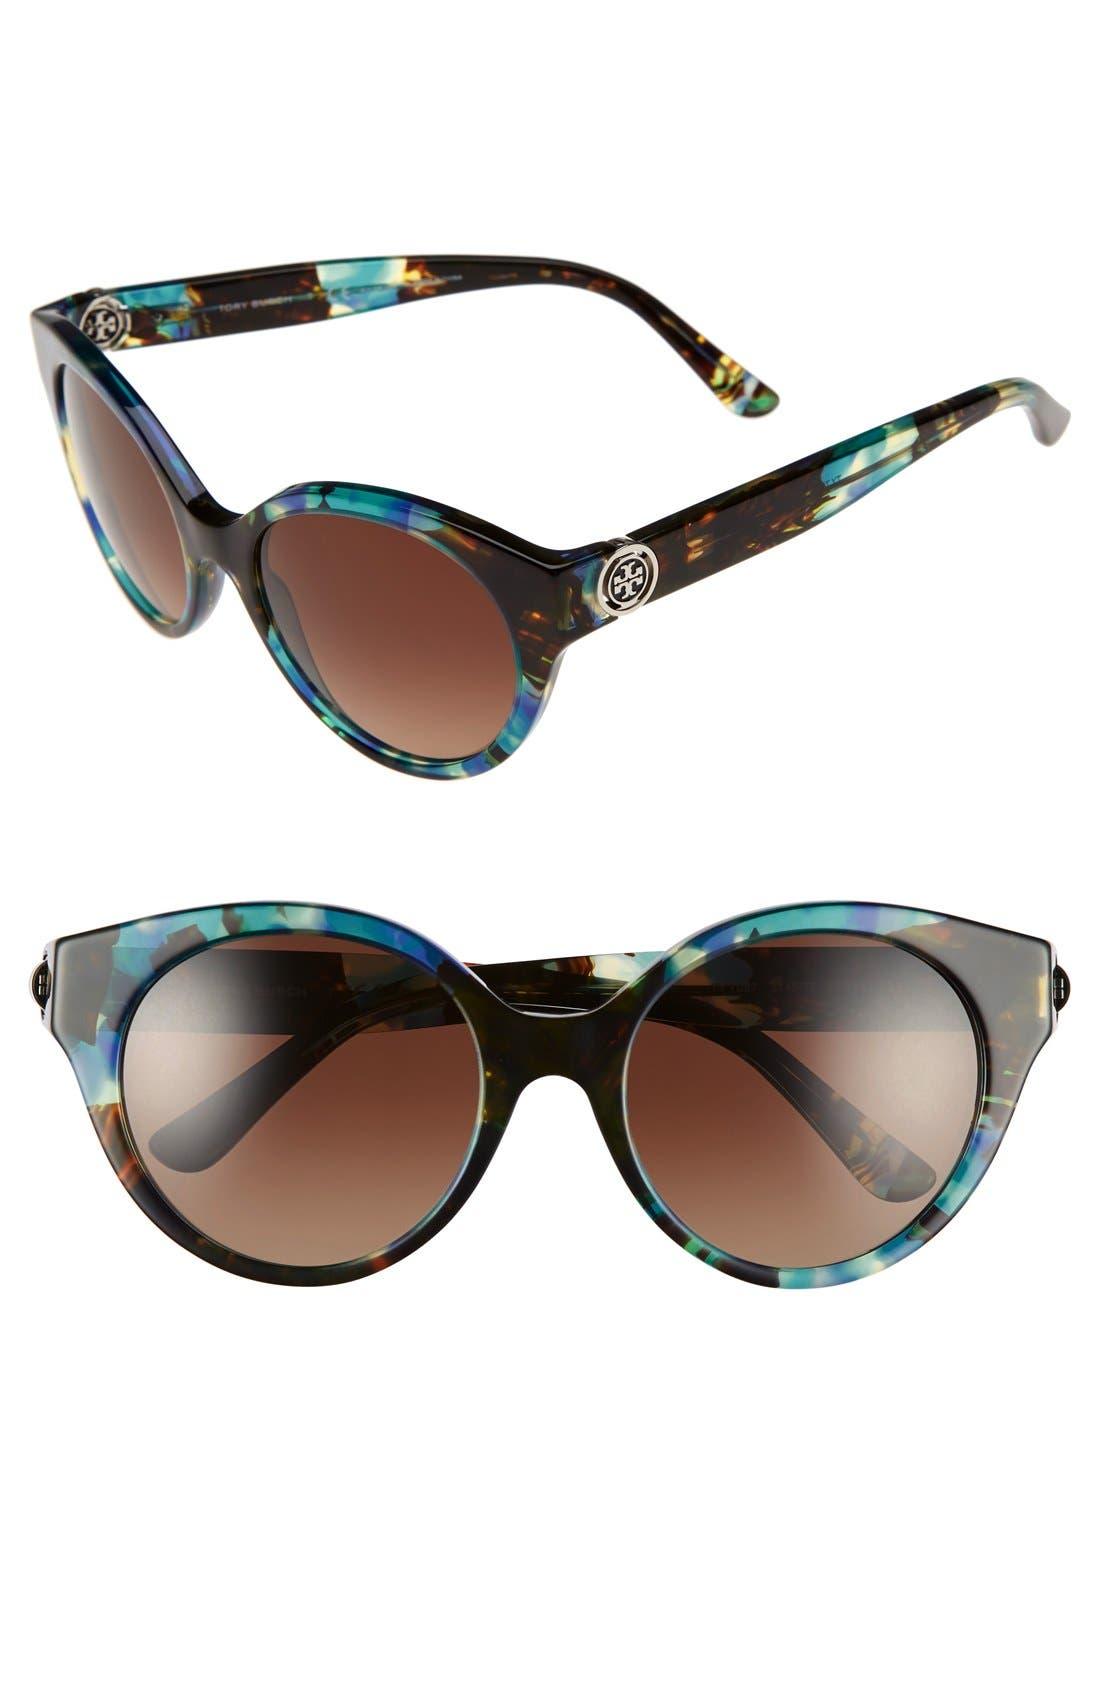 Main Image - Tory Burch 52mm Polarized Cat Eye Sunglasses